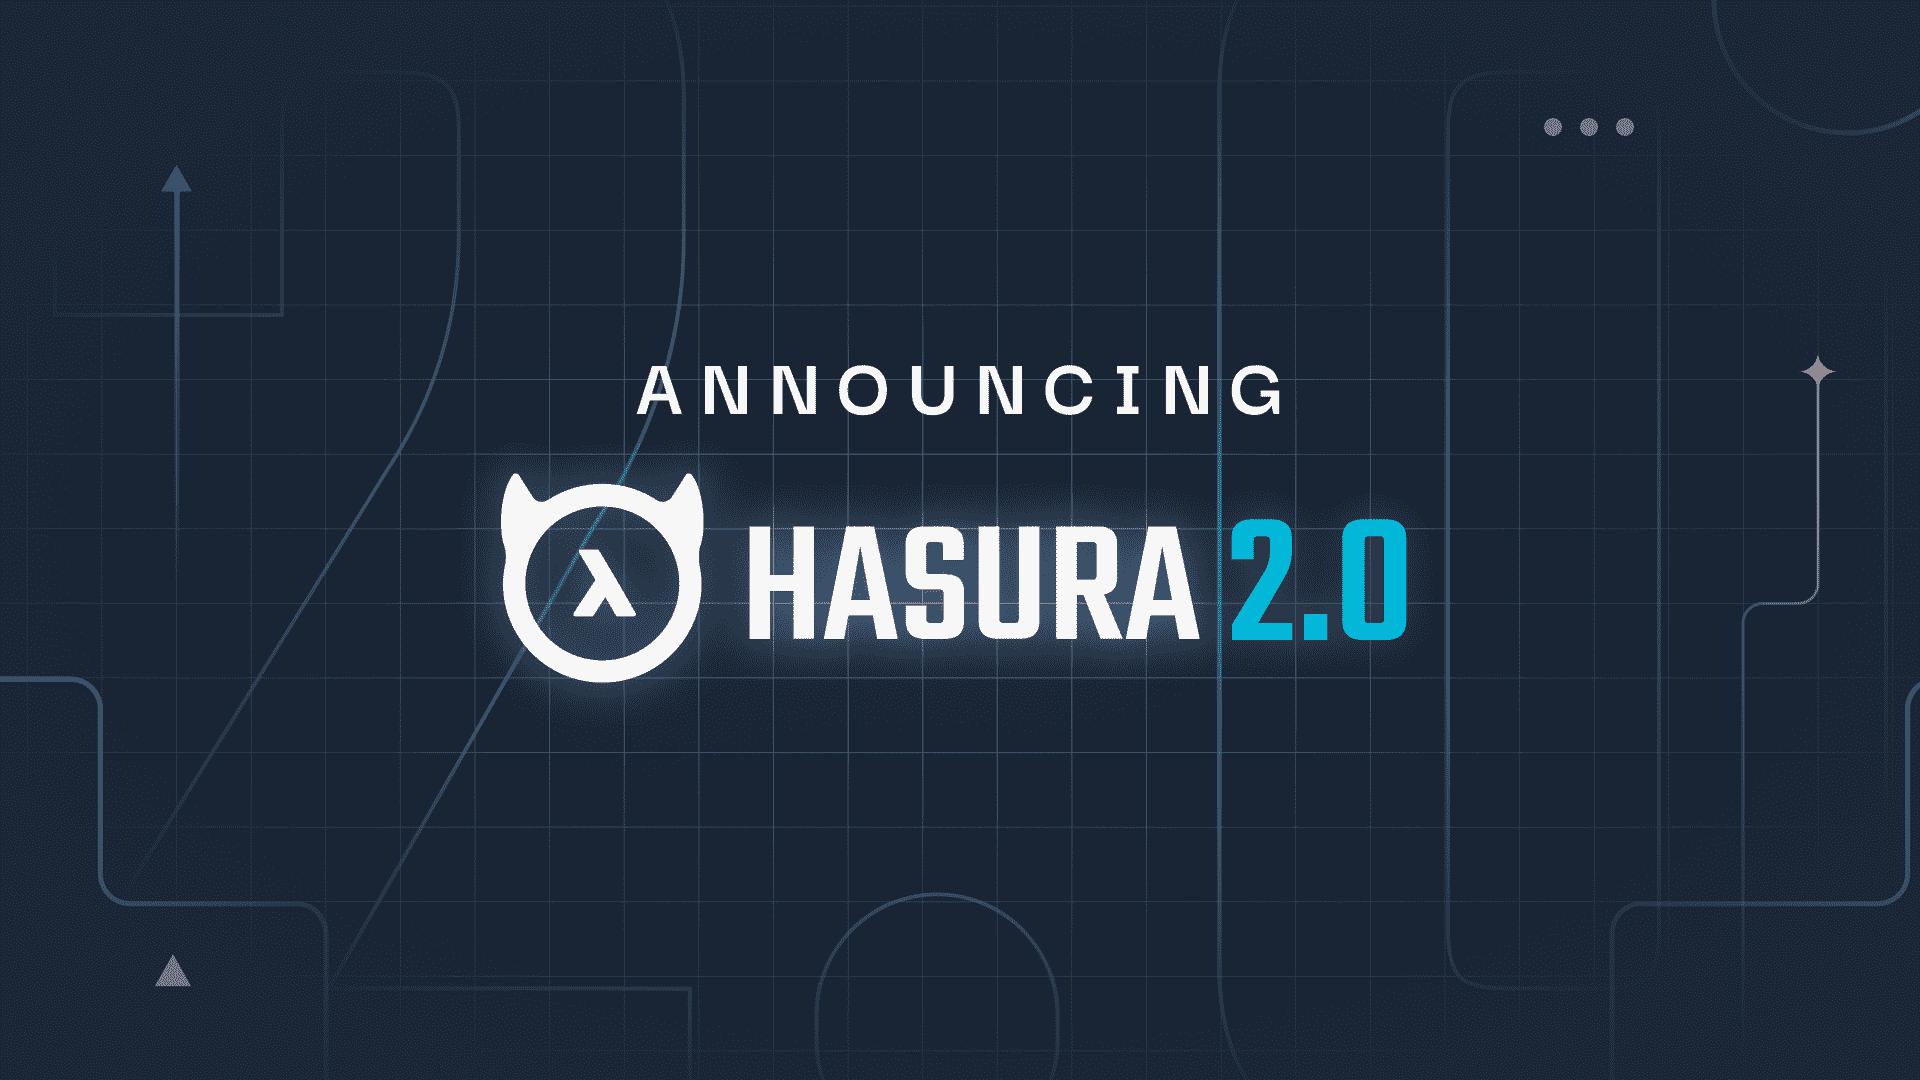 Announcing Hasura 2.0